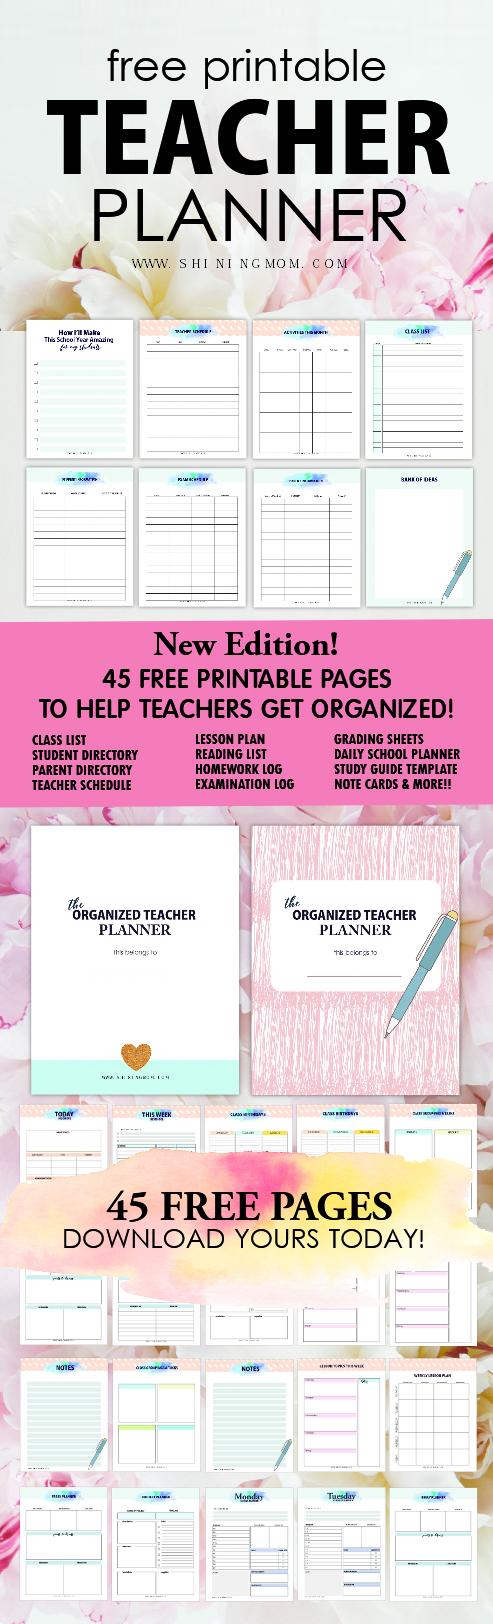 Free Printable Teacher Planner: 45+ School Organizing Templates! - Free Printable Teacher Planner